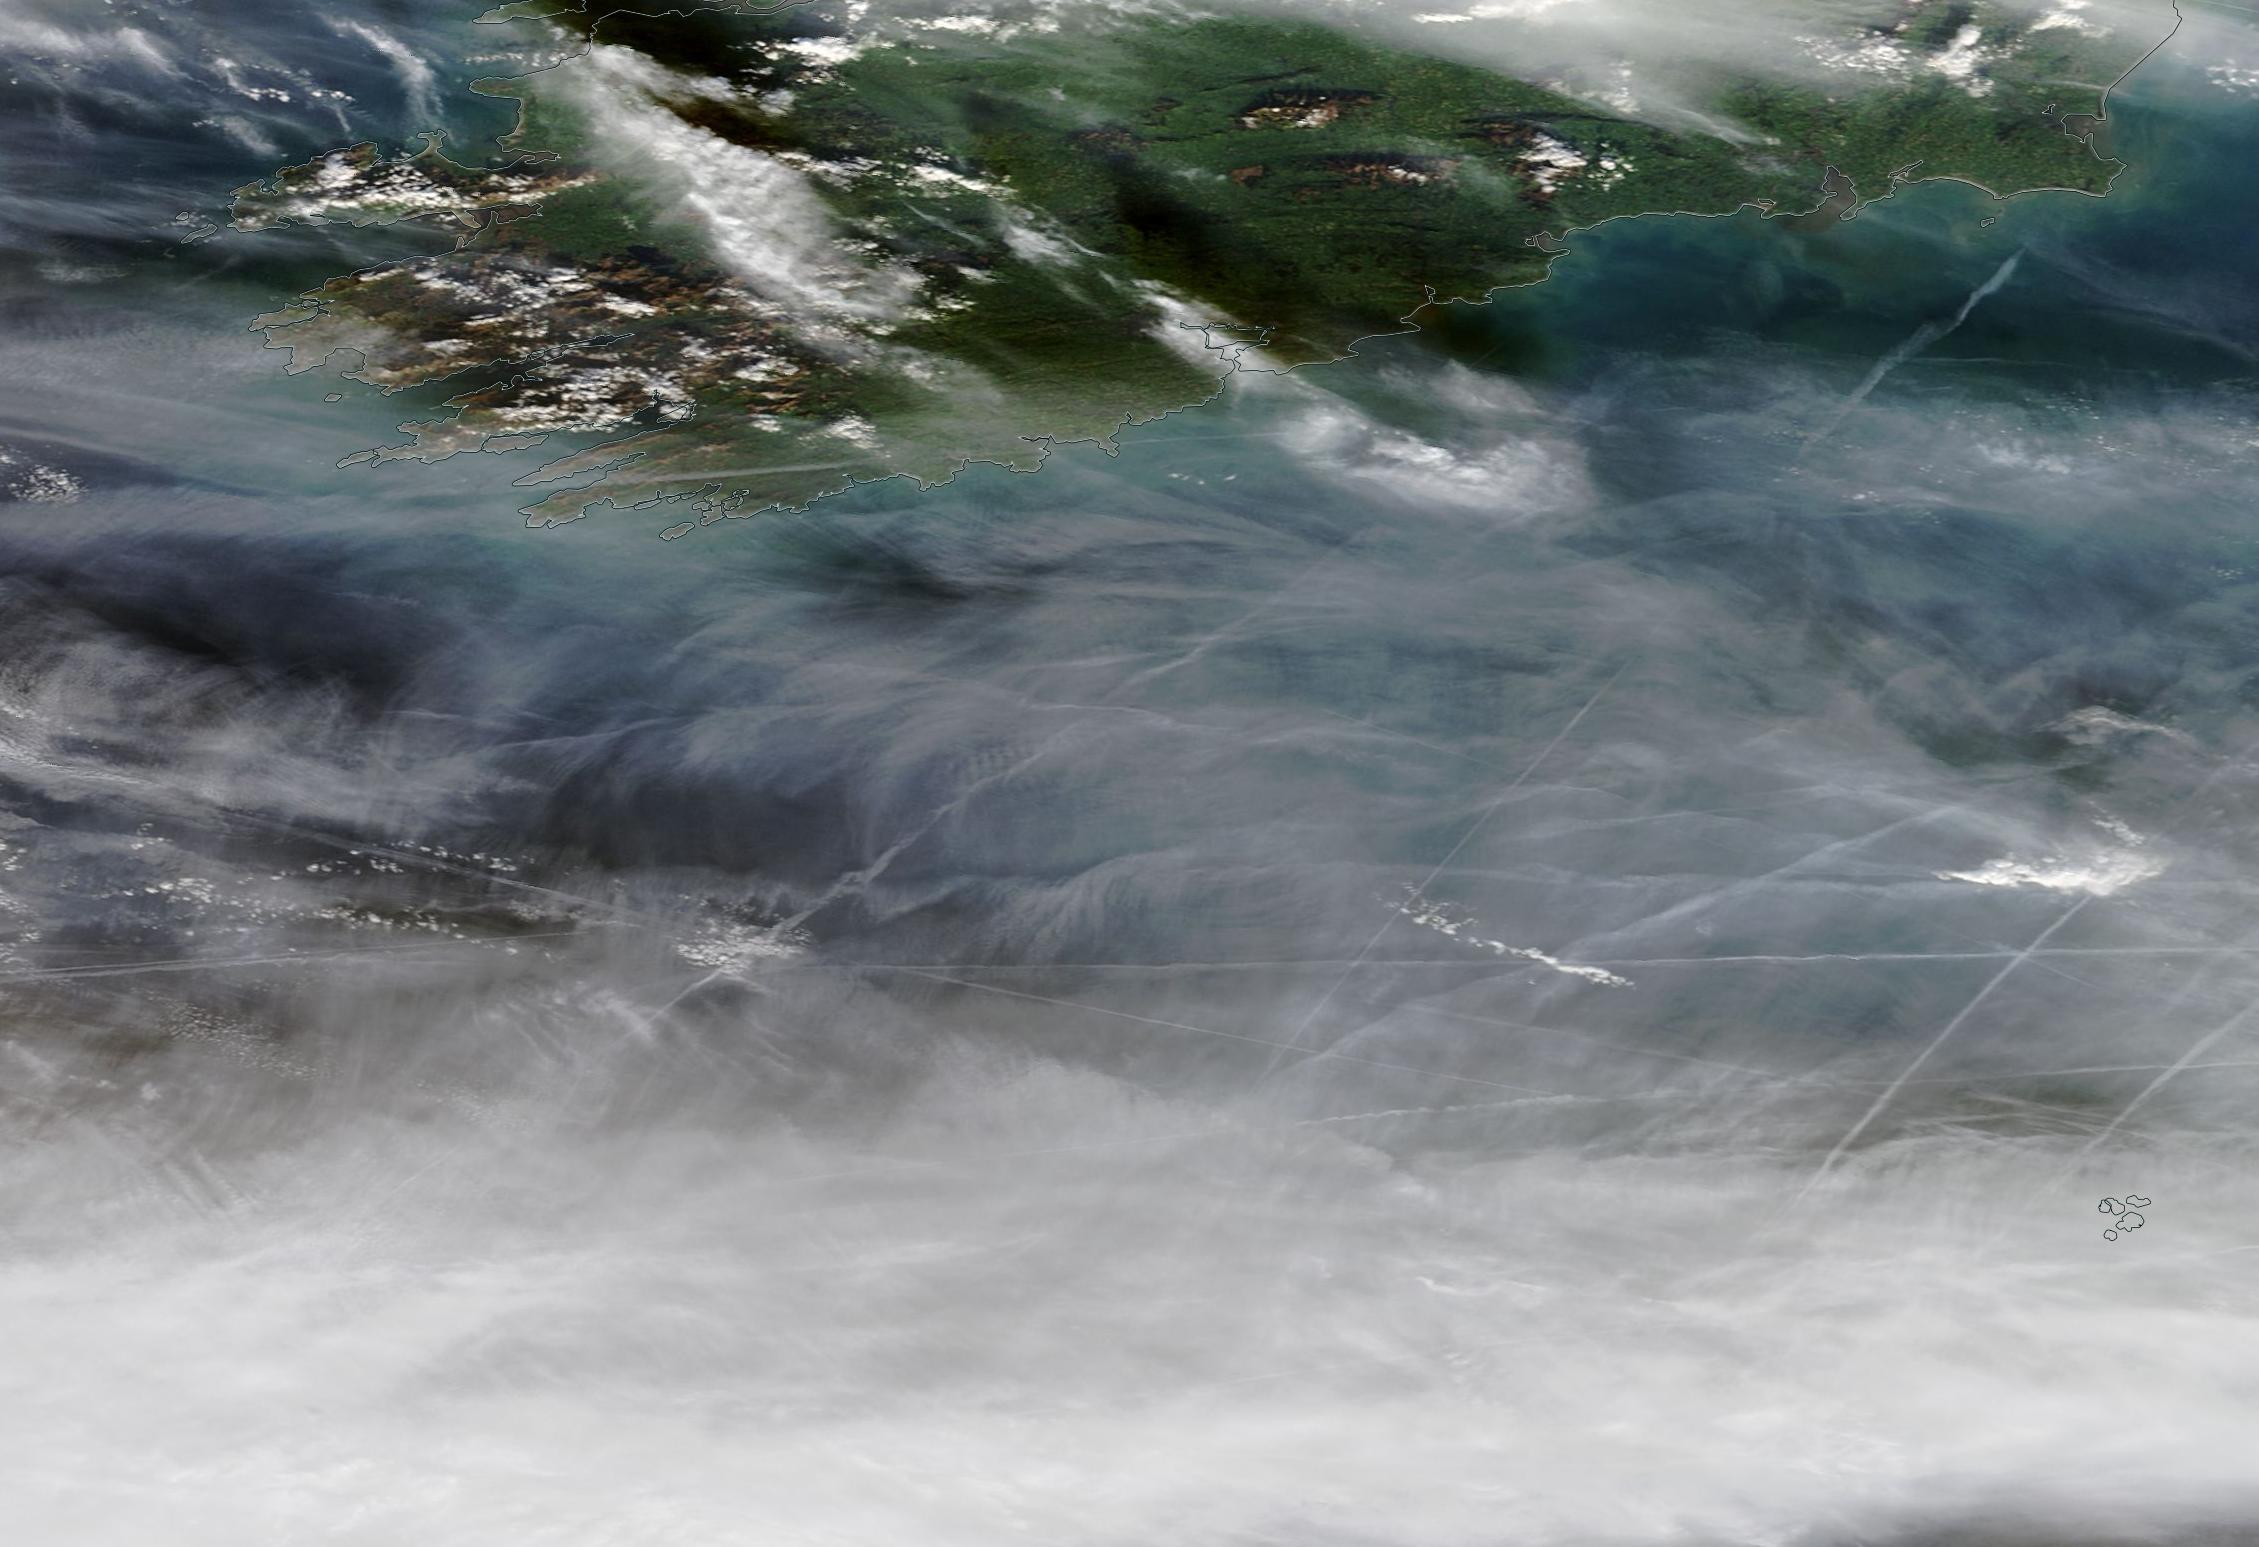 Cork, Waterford, southern Ireland chemtrail geoengineering NASA Worldview 22nd Dec 2018 https://go.nasa.gov/33Dvh19